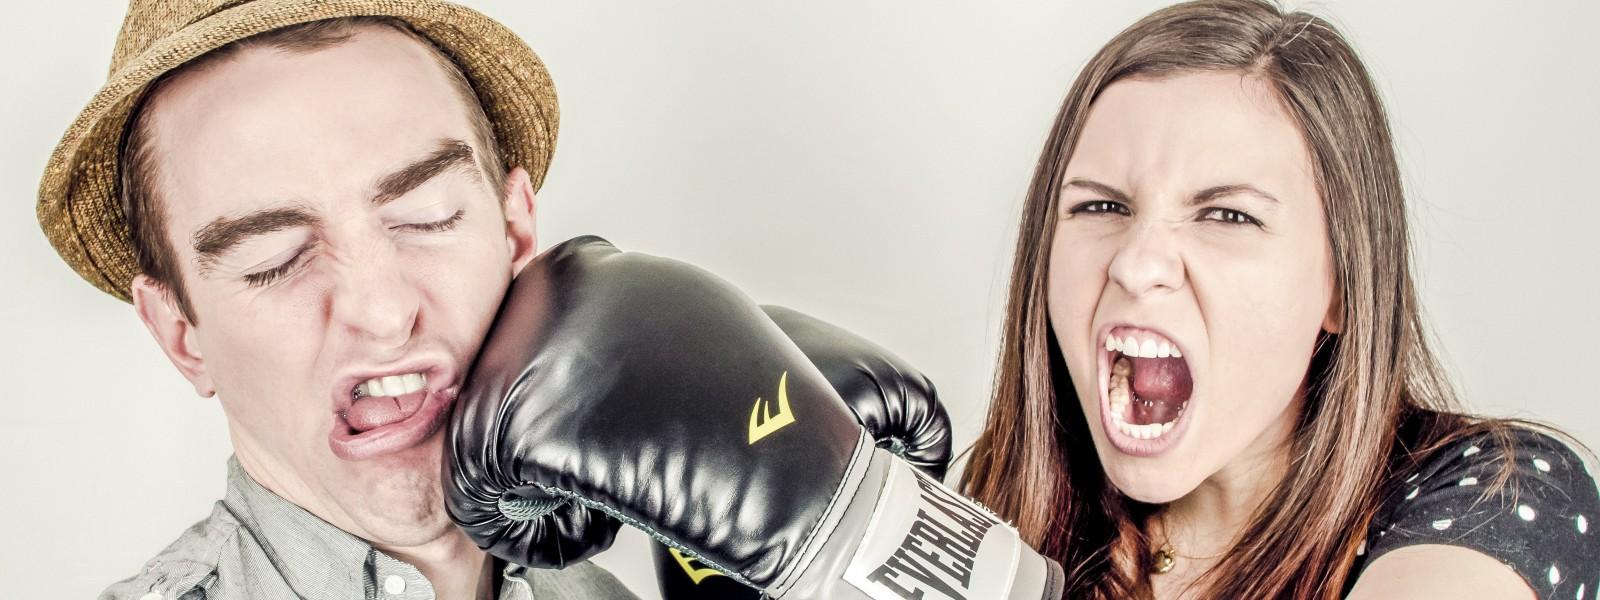 woman wearing boxing gloves punching a man